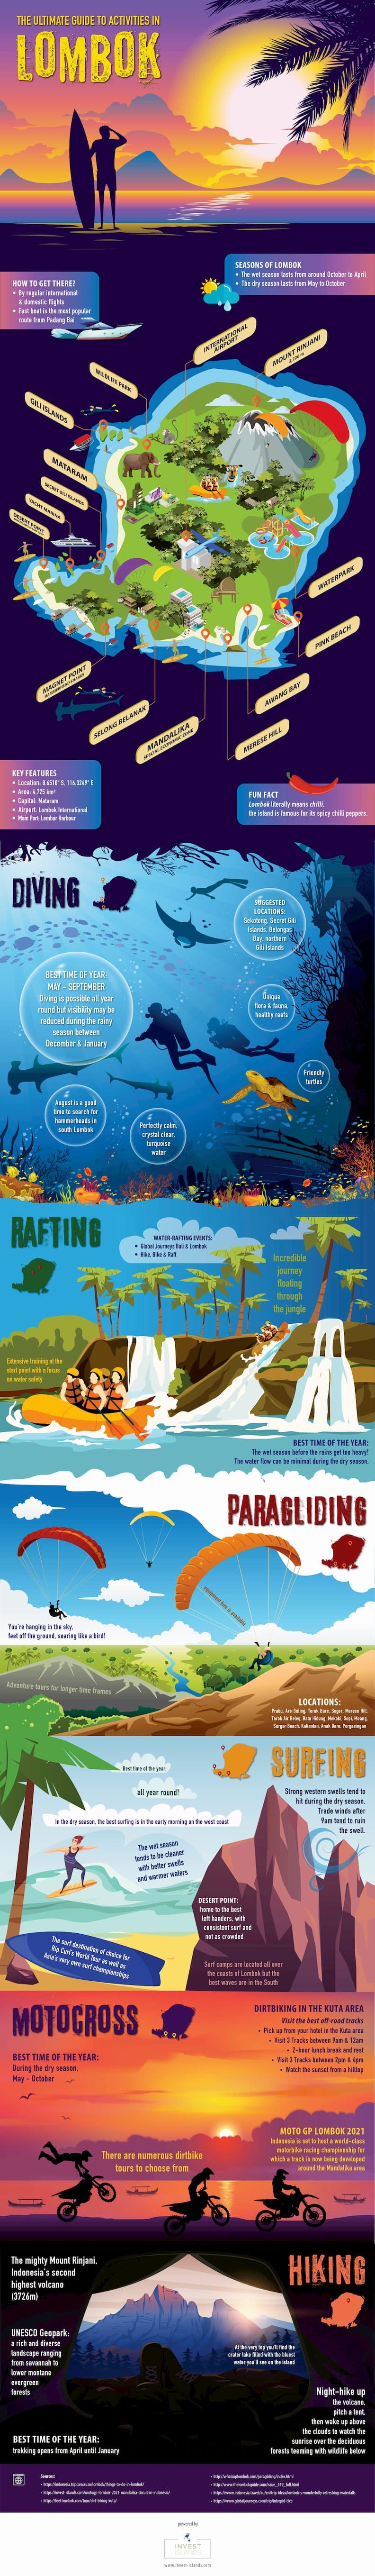 island of lombok infographic